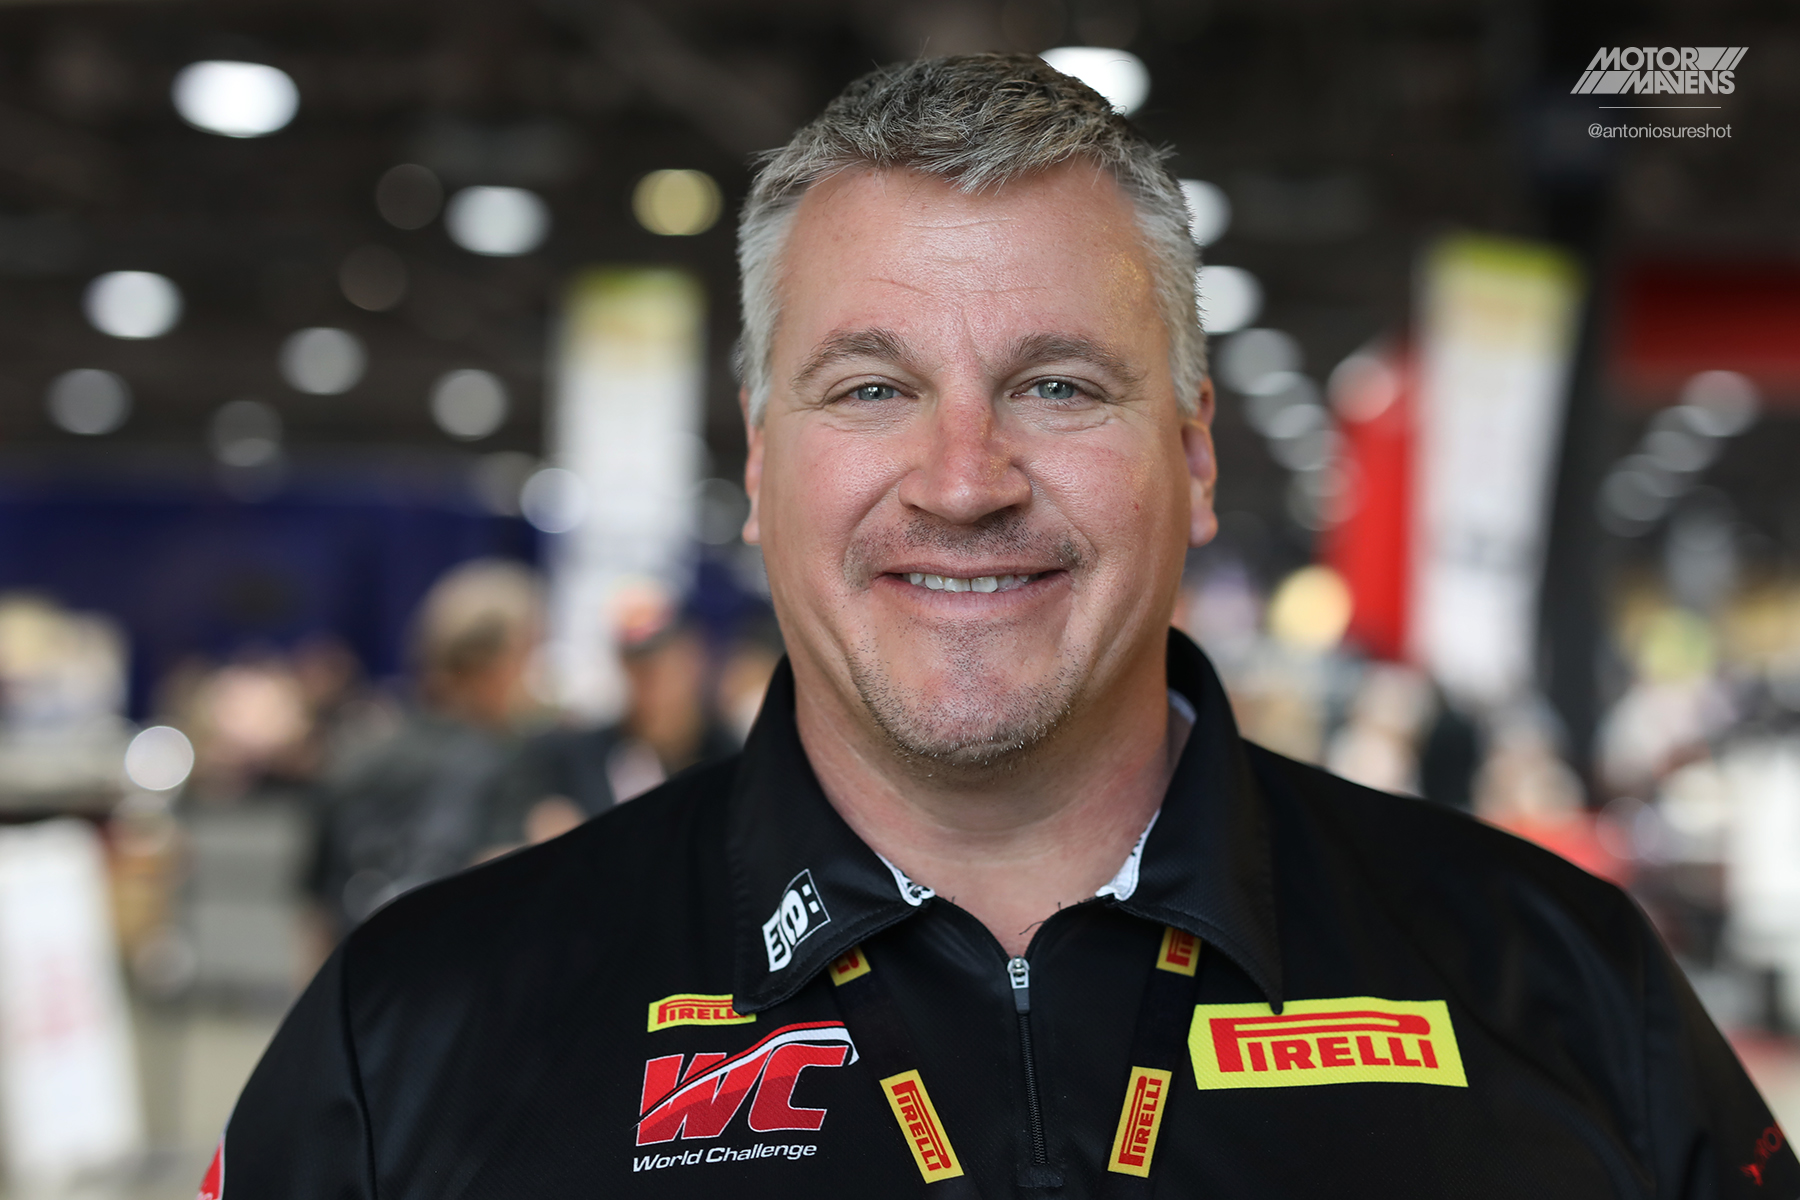 Euroworld Motorsports Pirelli World Challenge Frank Lee